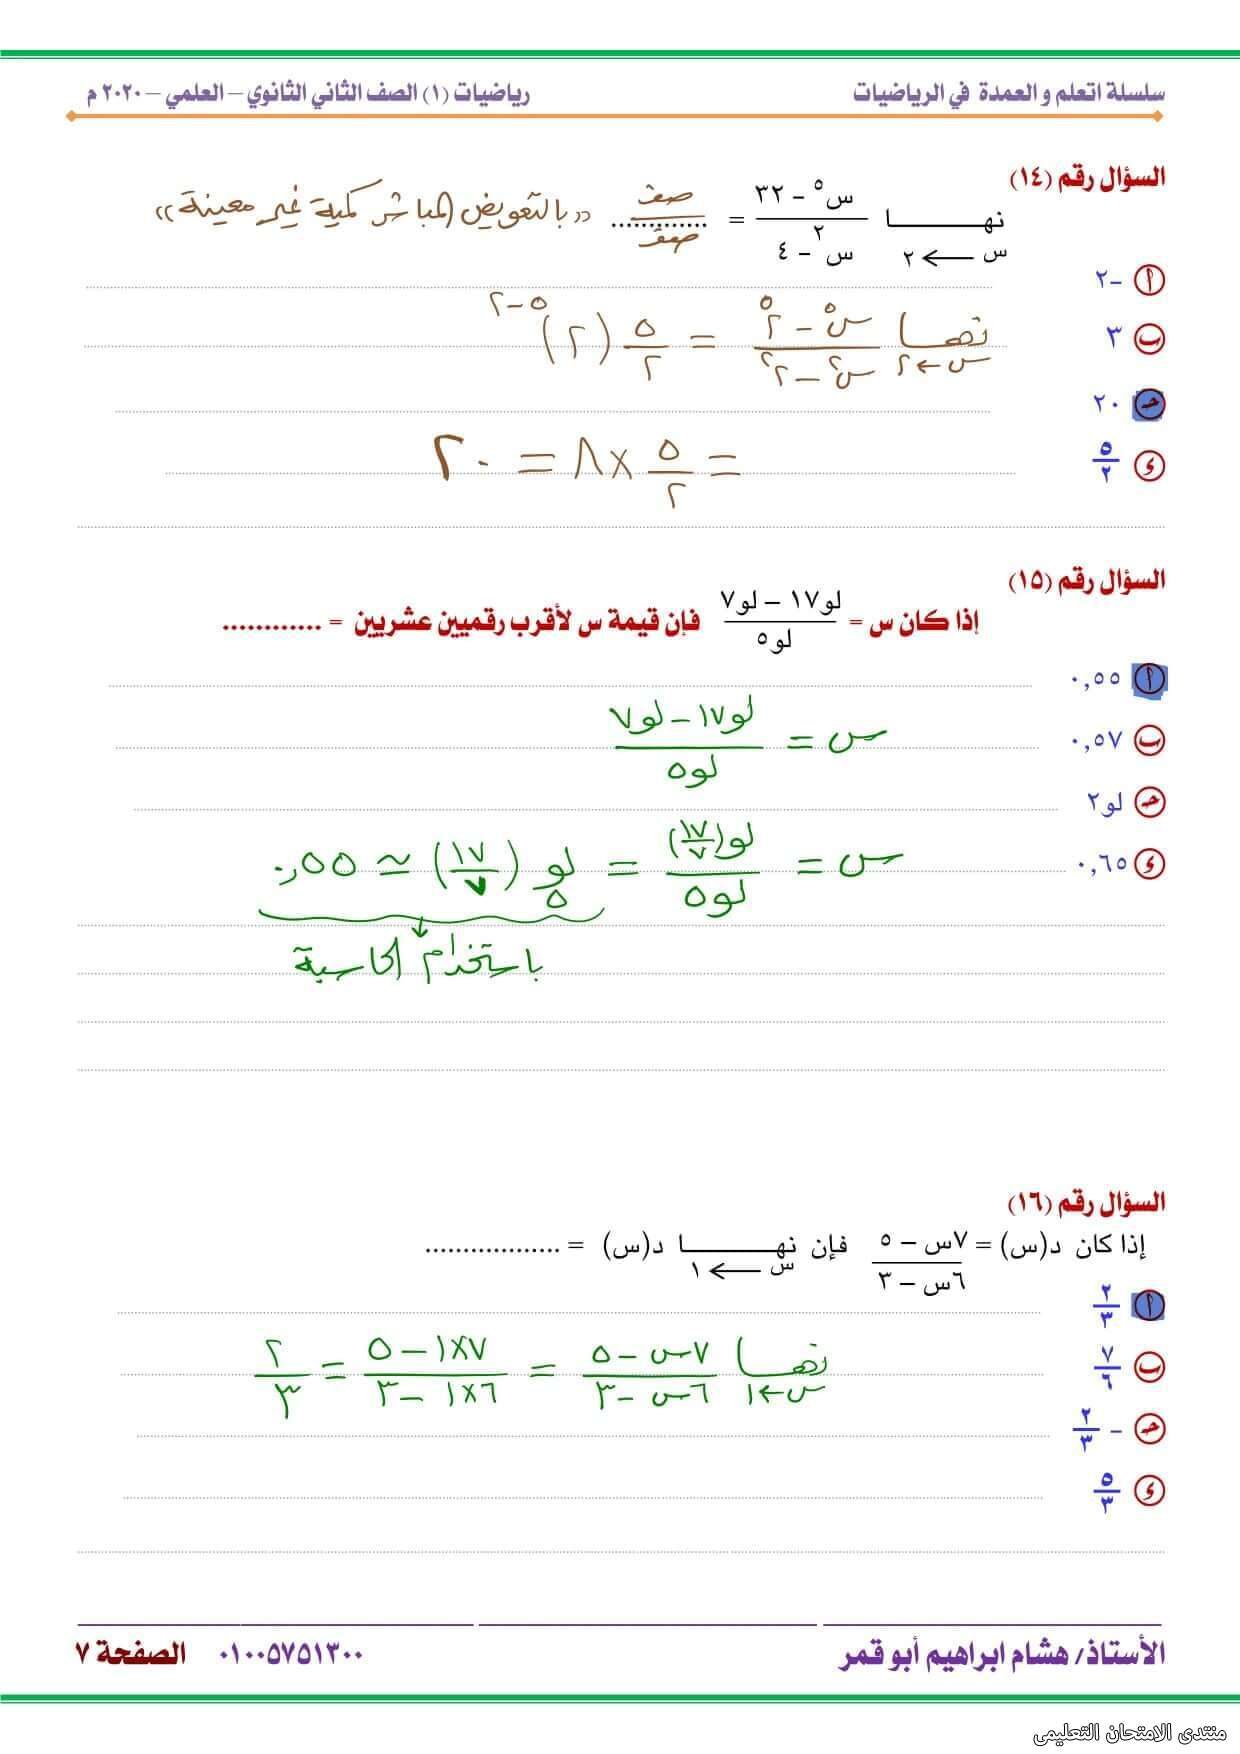 exam-eg.com_1614440949446.jpg